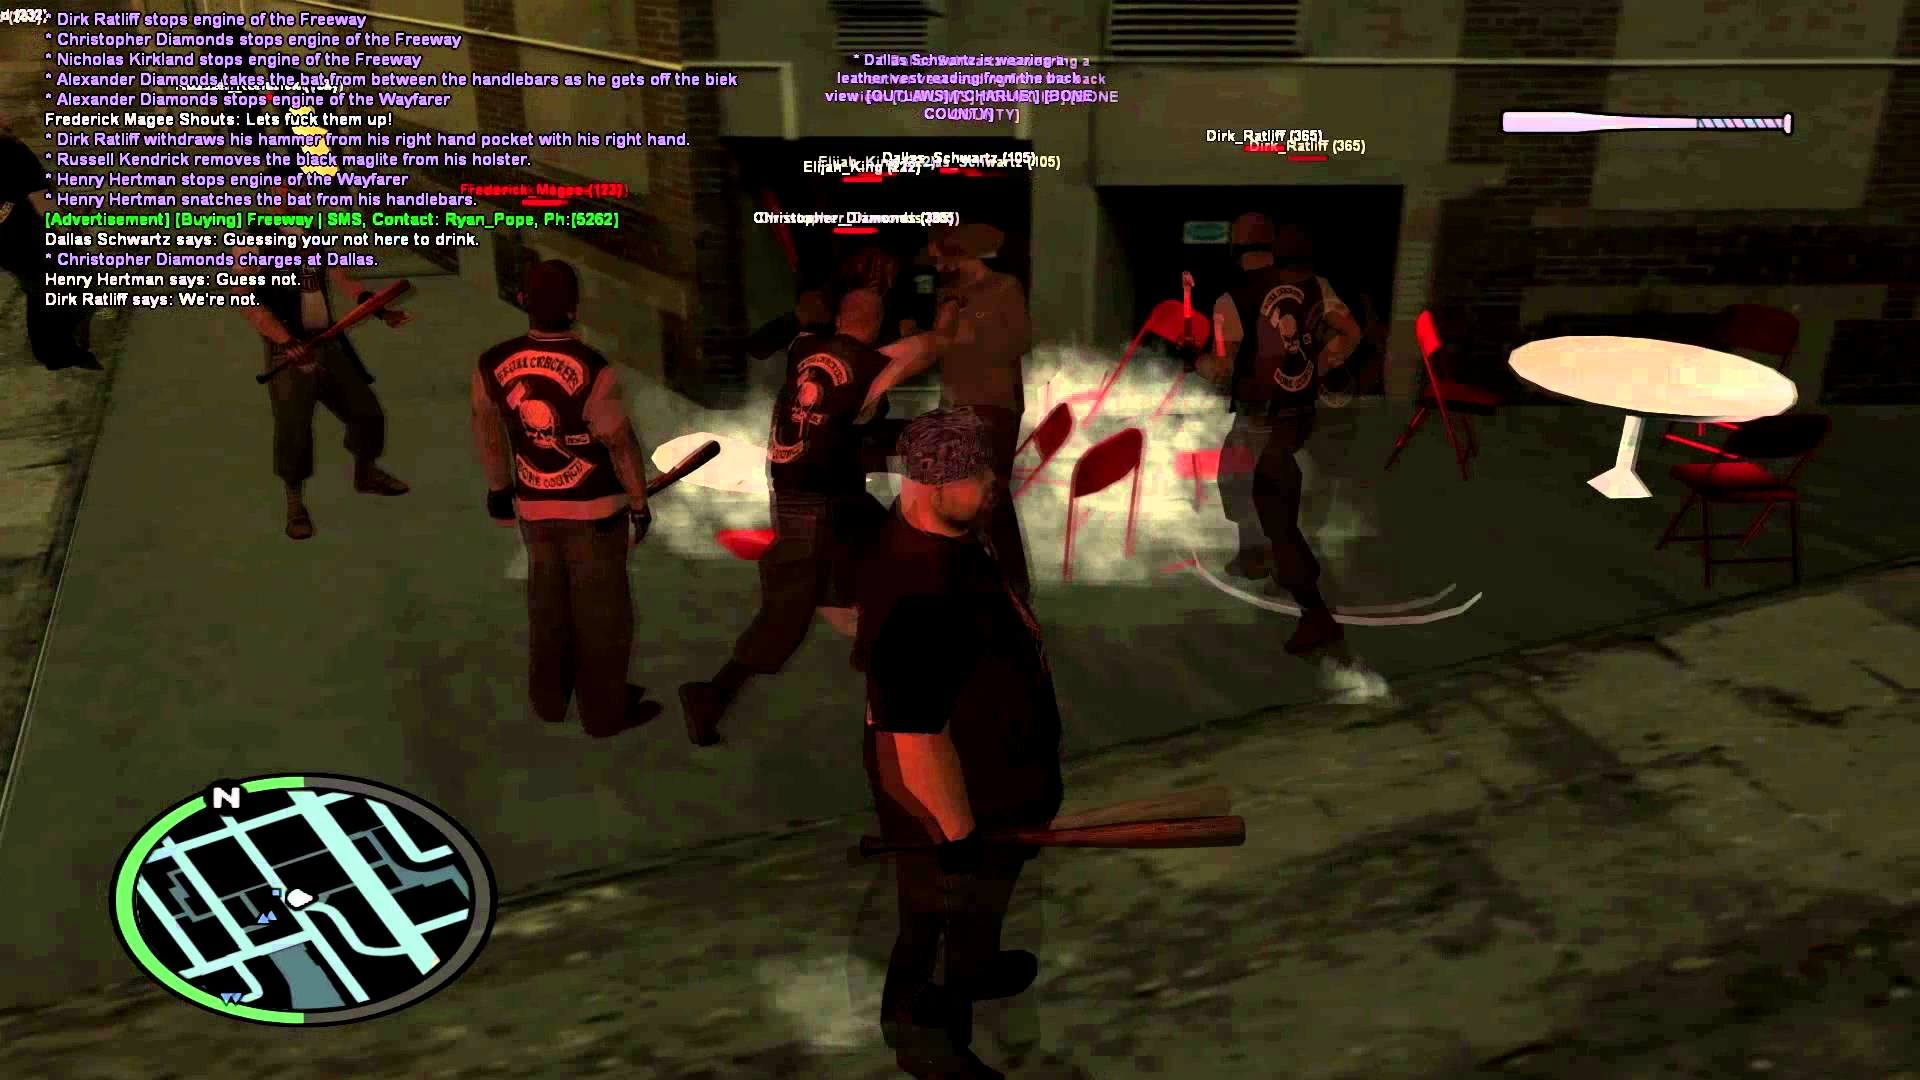 Skull Crackers MC brawling Outlaws MC at their own bar